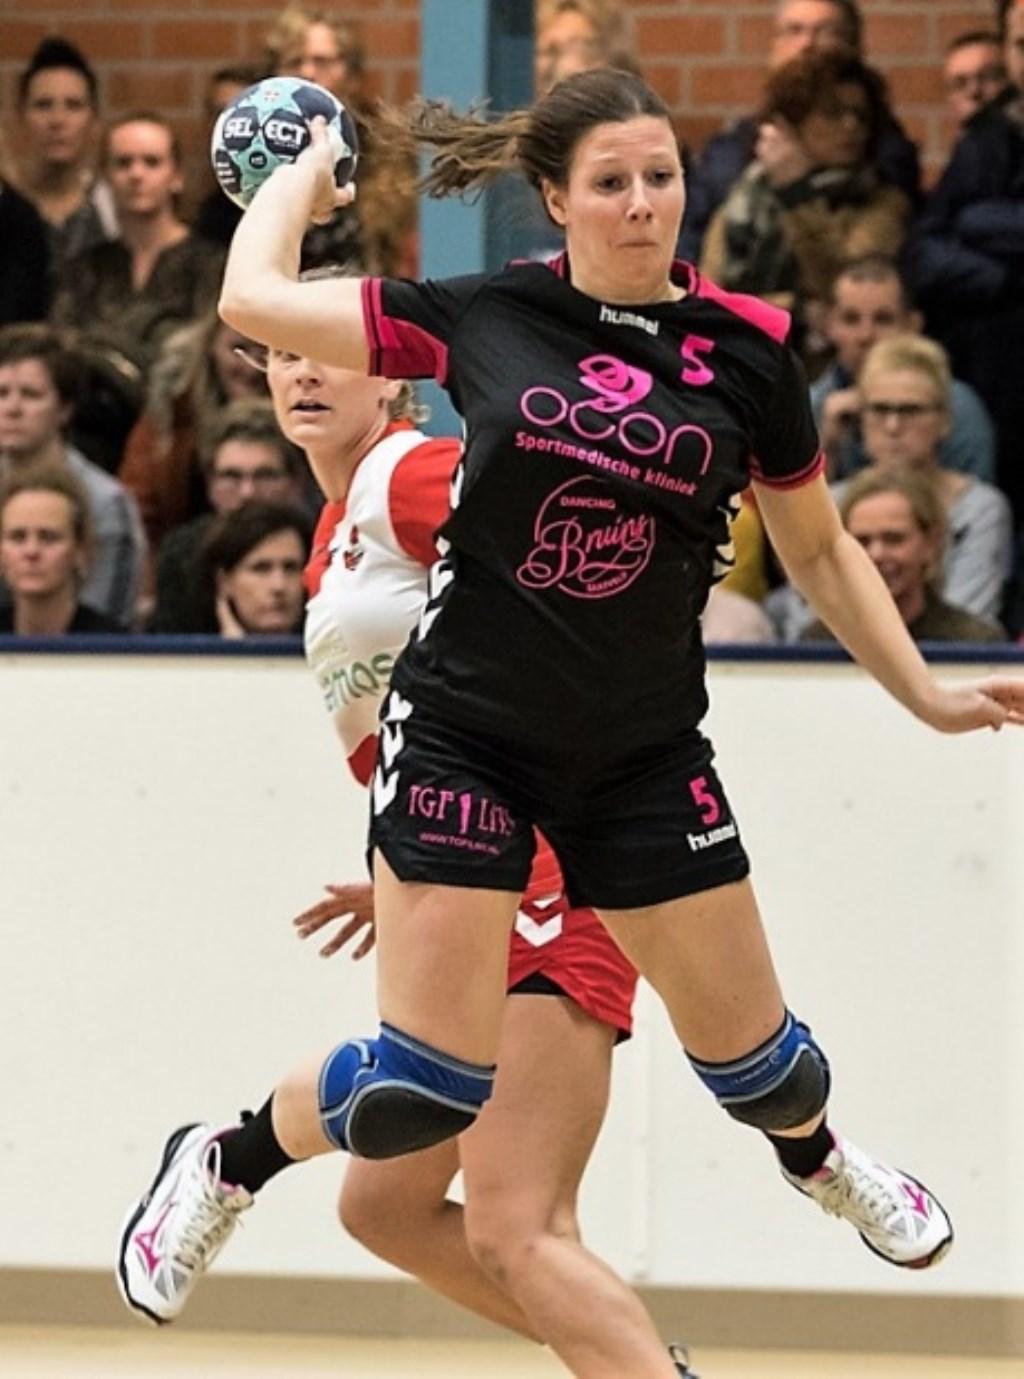 Tara Grashof was weer een sterkhouder van Borhave.